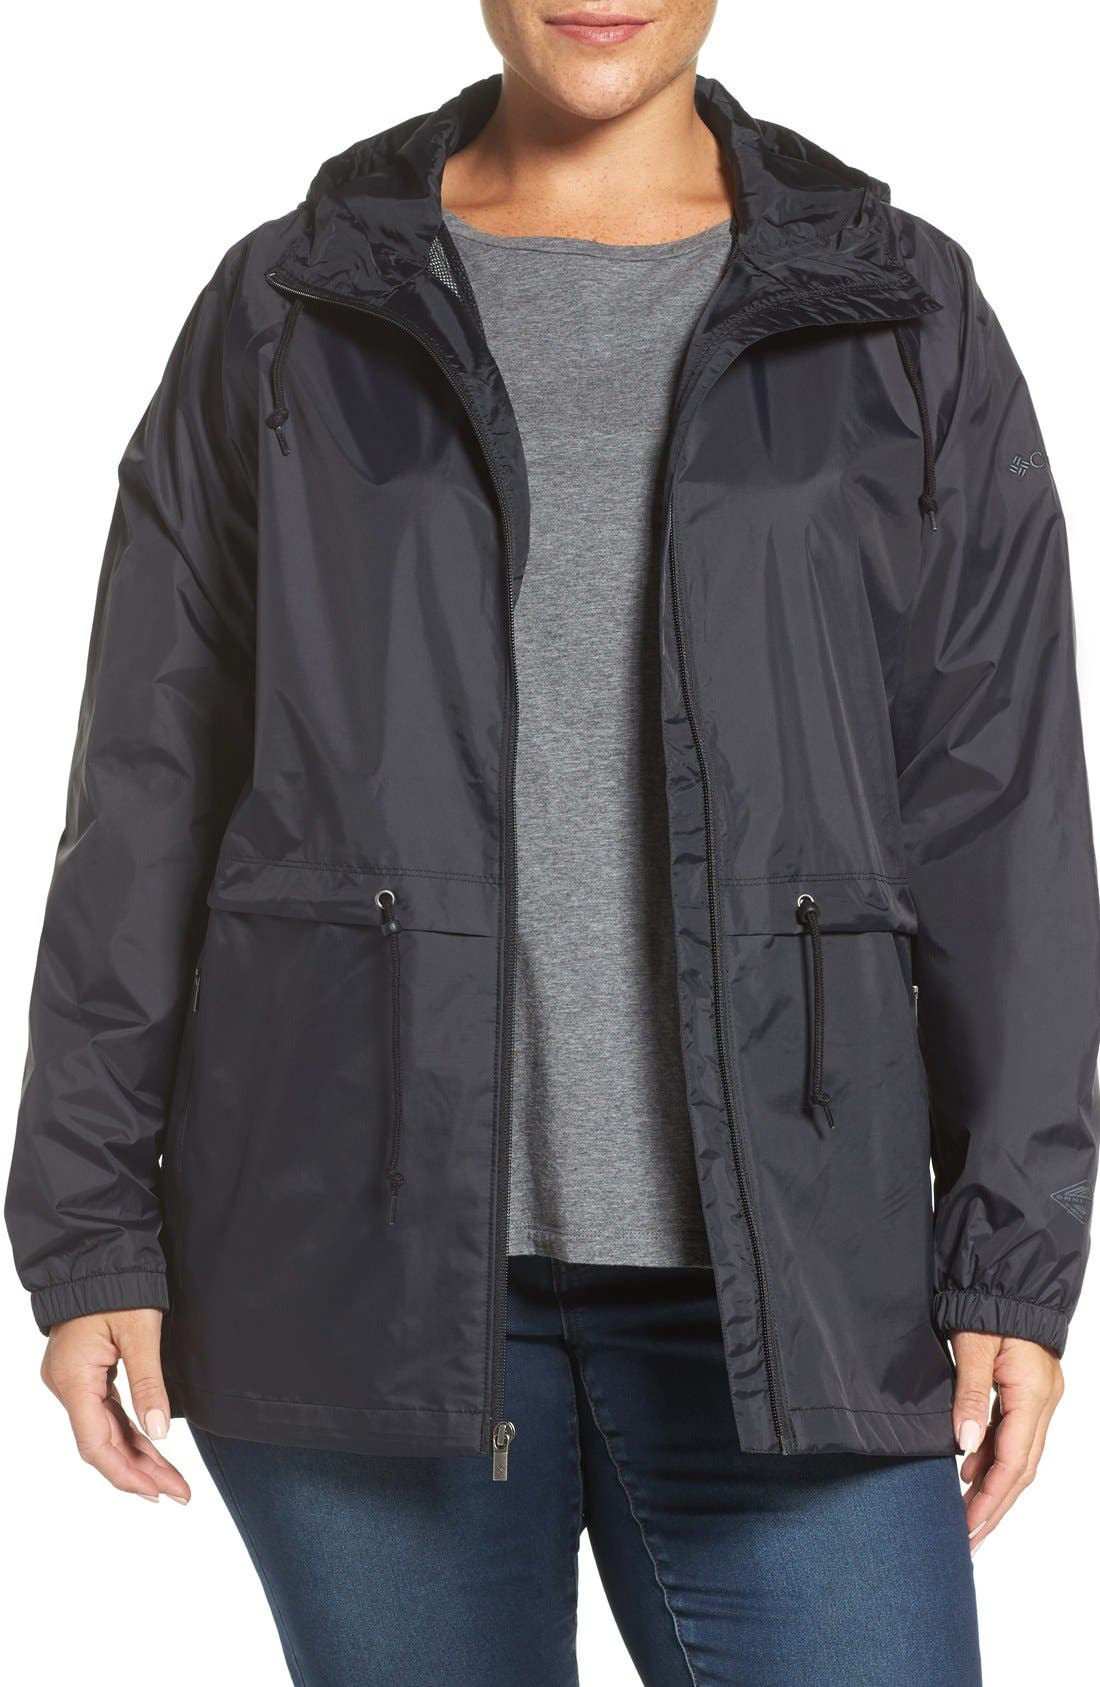 'Arcadia' Hooded Waterproof Casual Jacket,                             Main thumbnail 5, color,